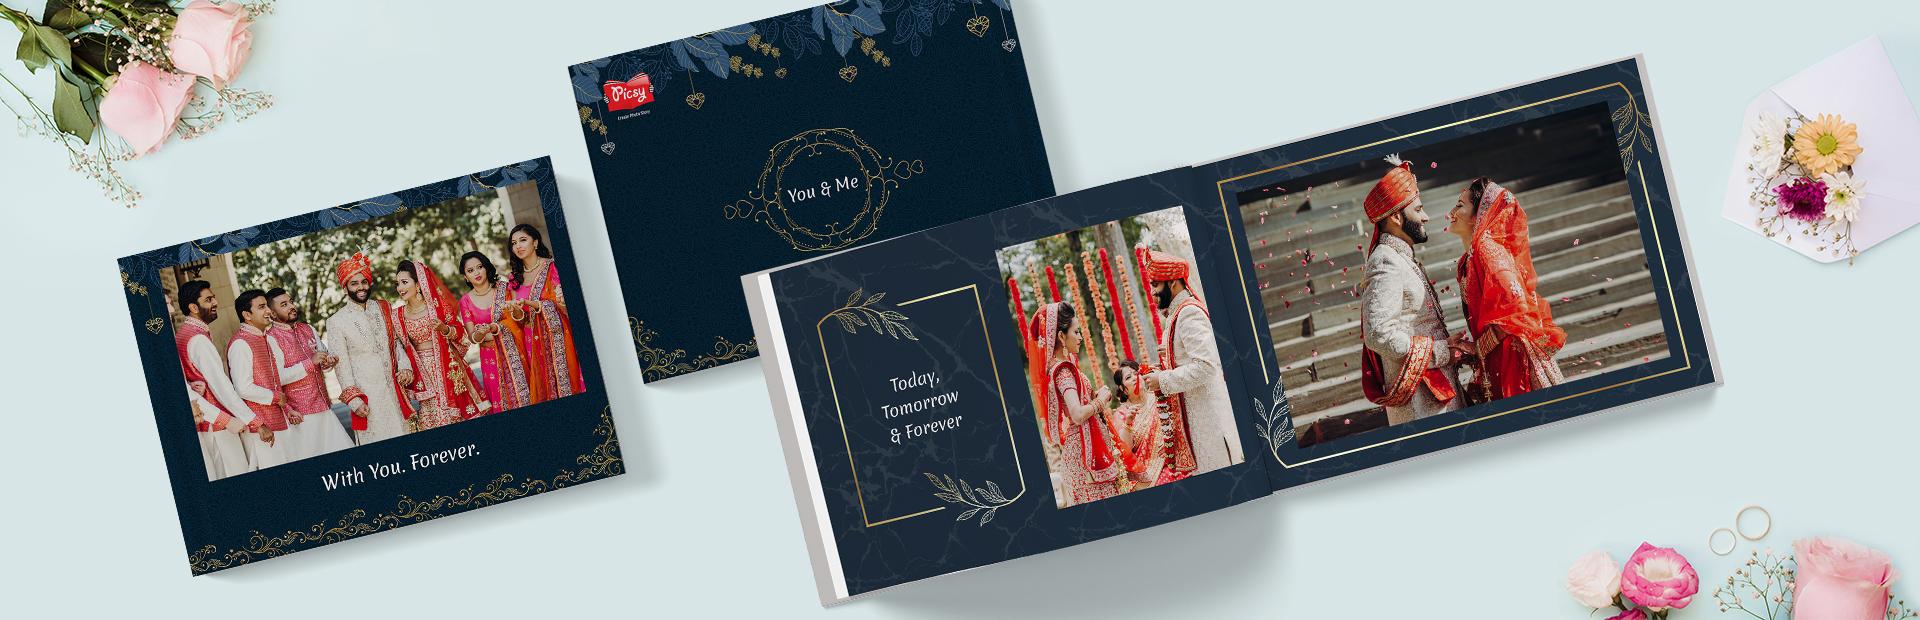 Wedding Moments Photo Books Online